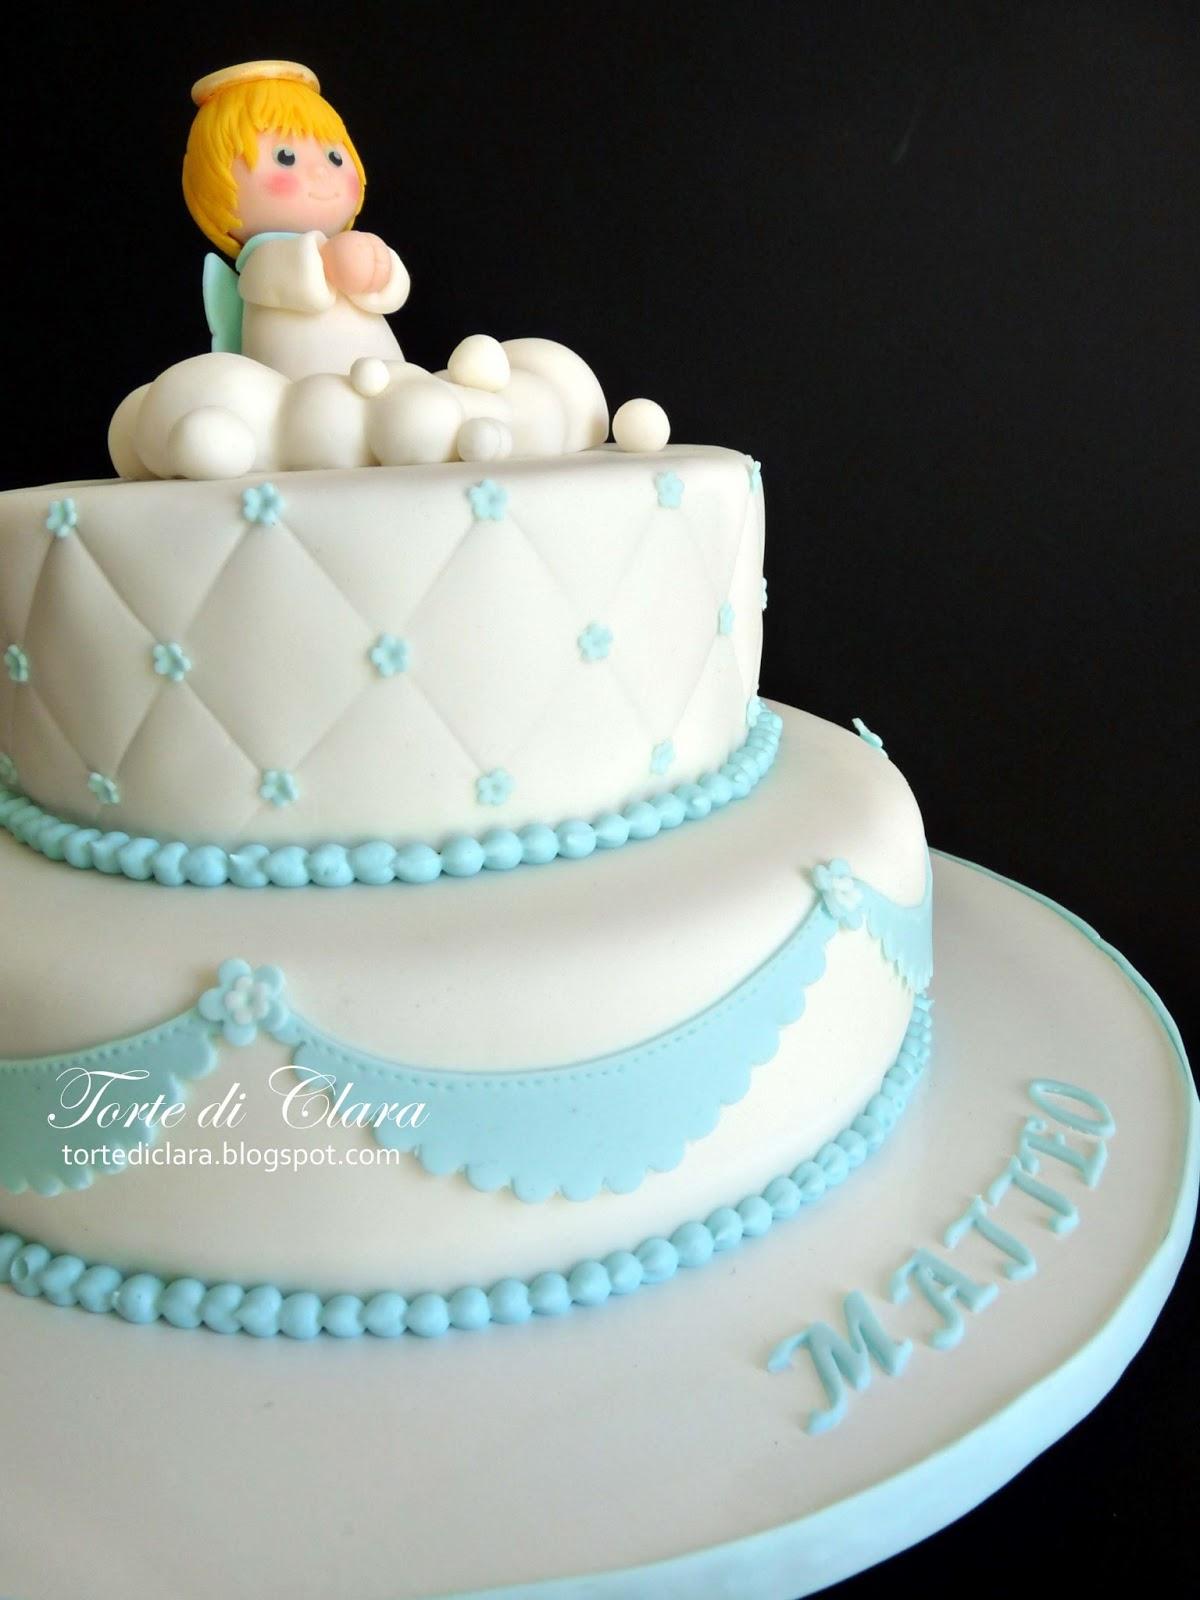 Amato Torte di Clara: Torta Battesimo ZP26